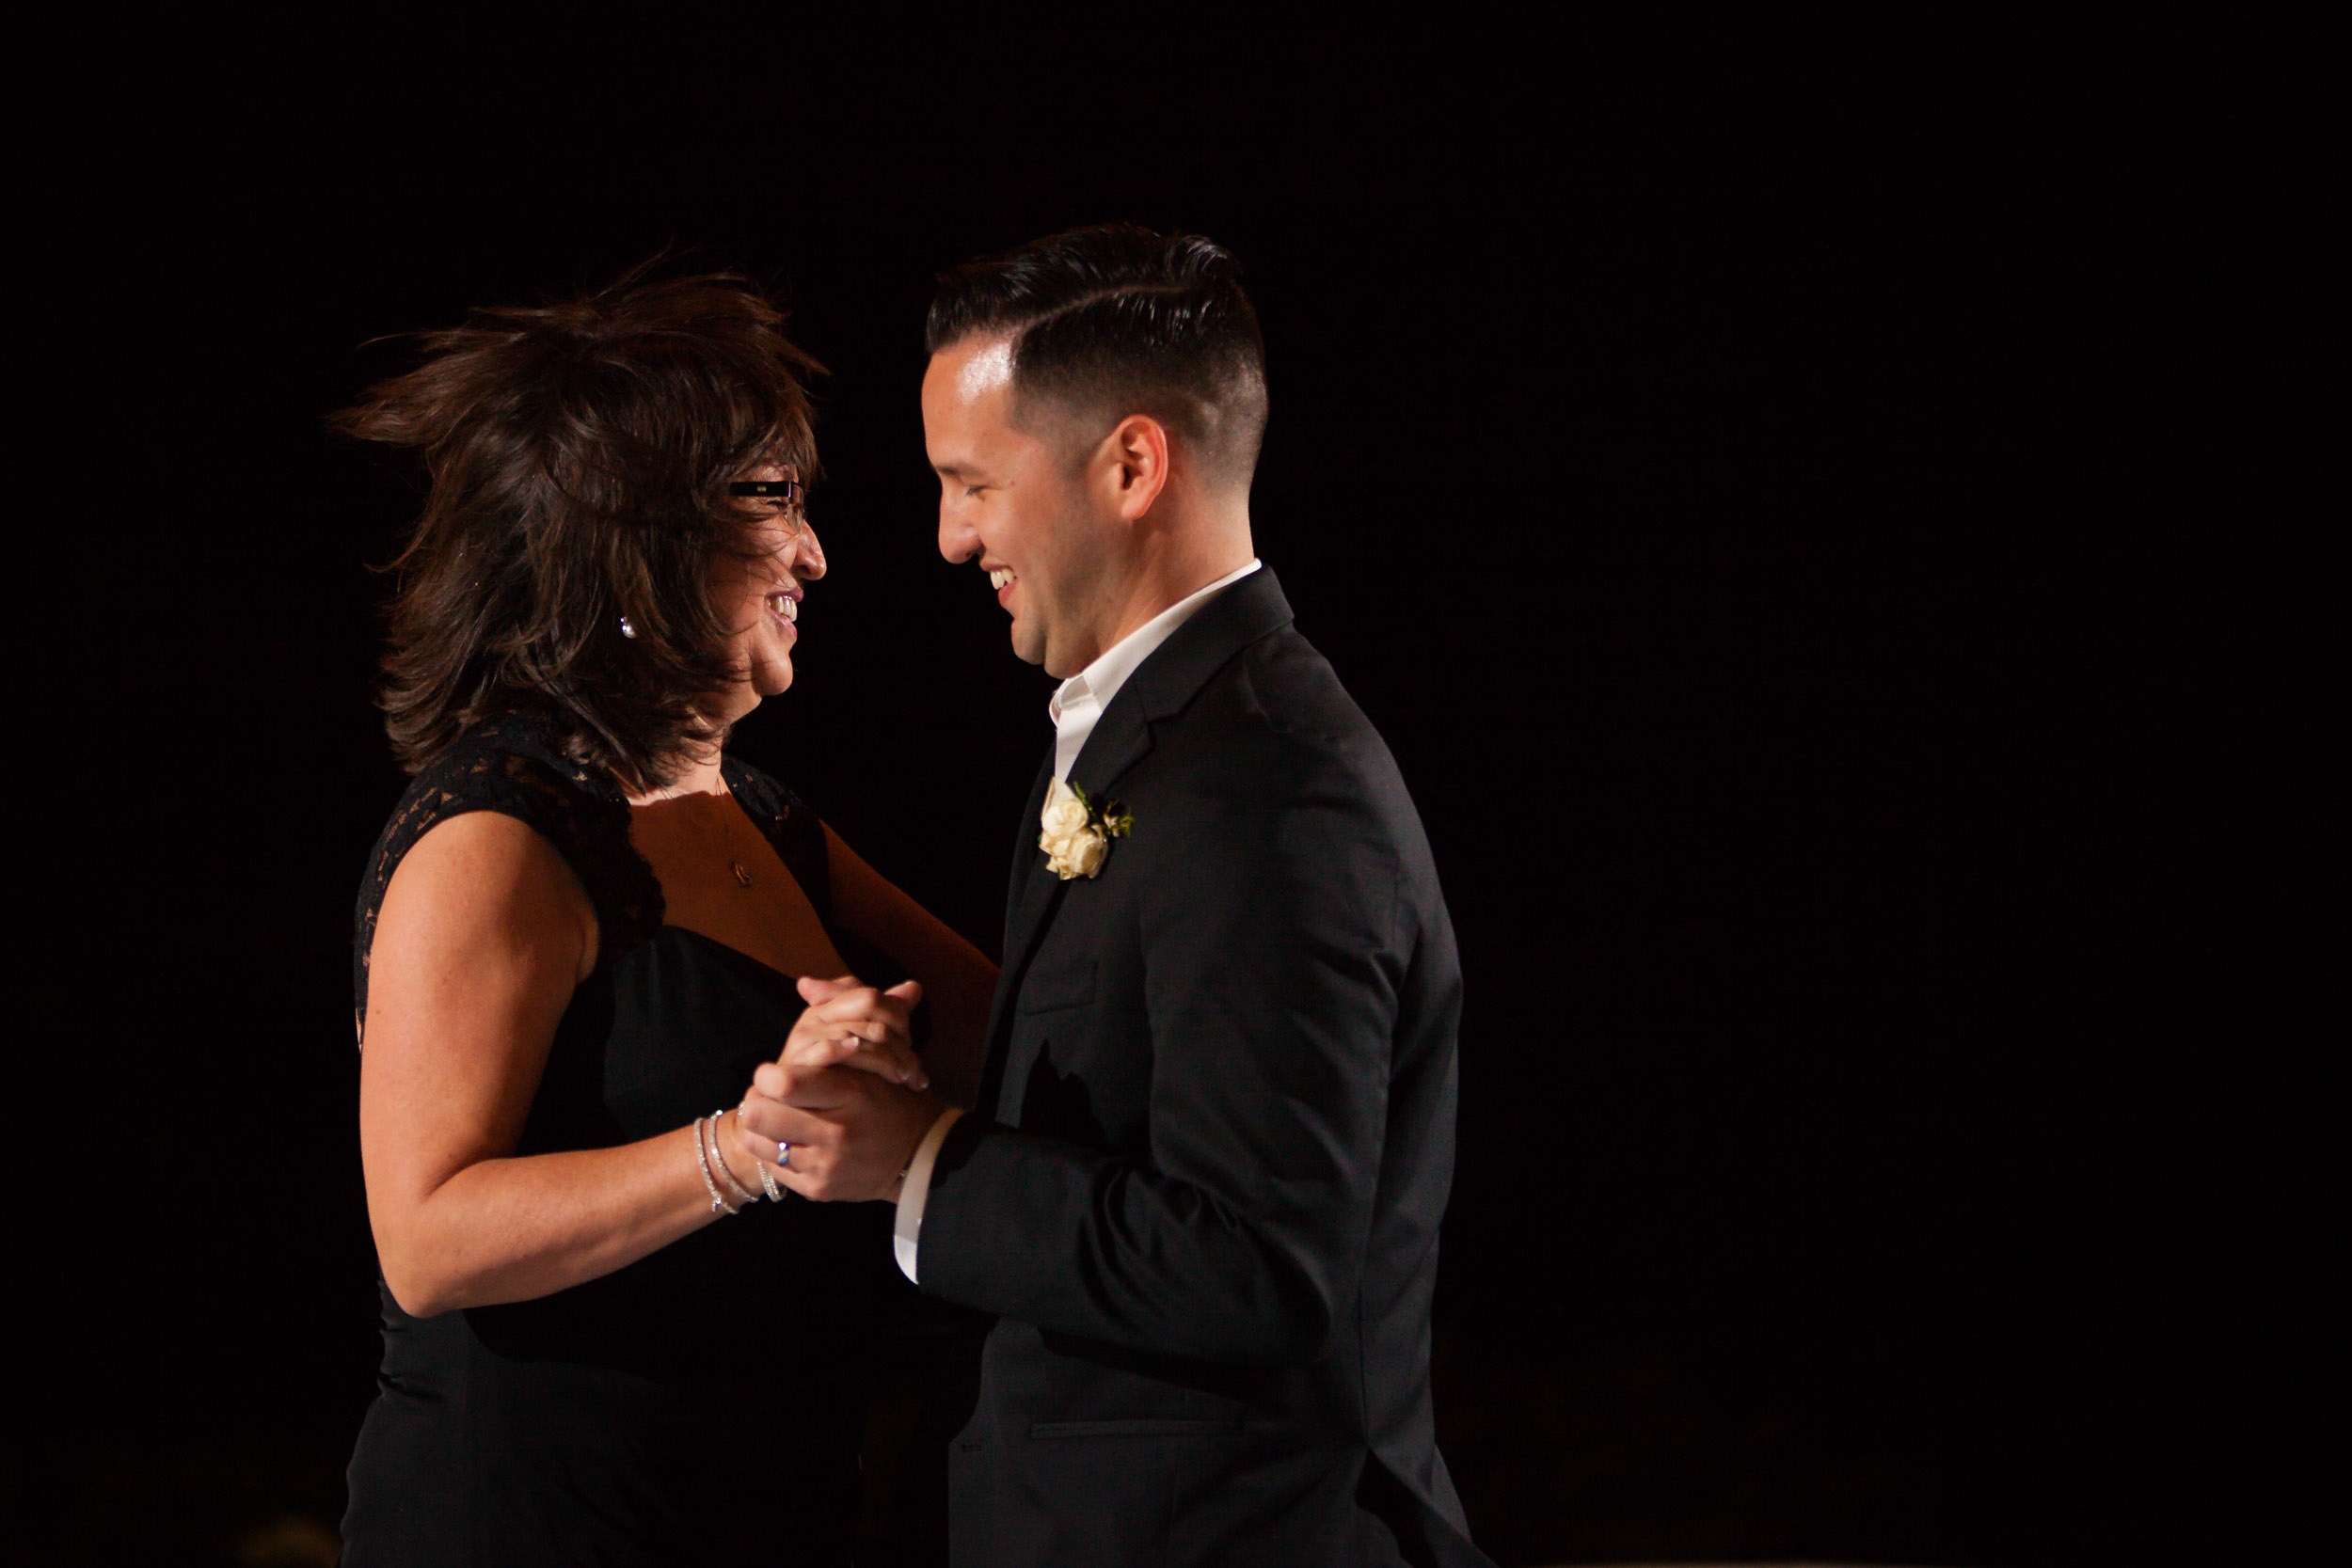 Flordia-Wedding-Photography-72.jpg